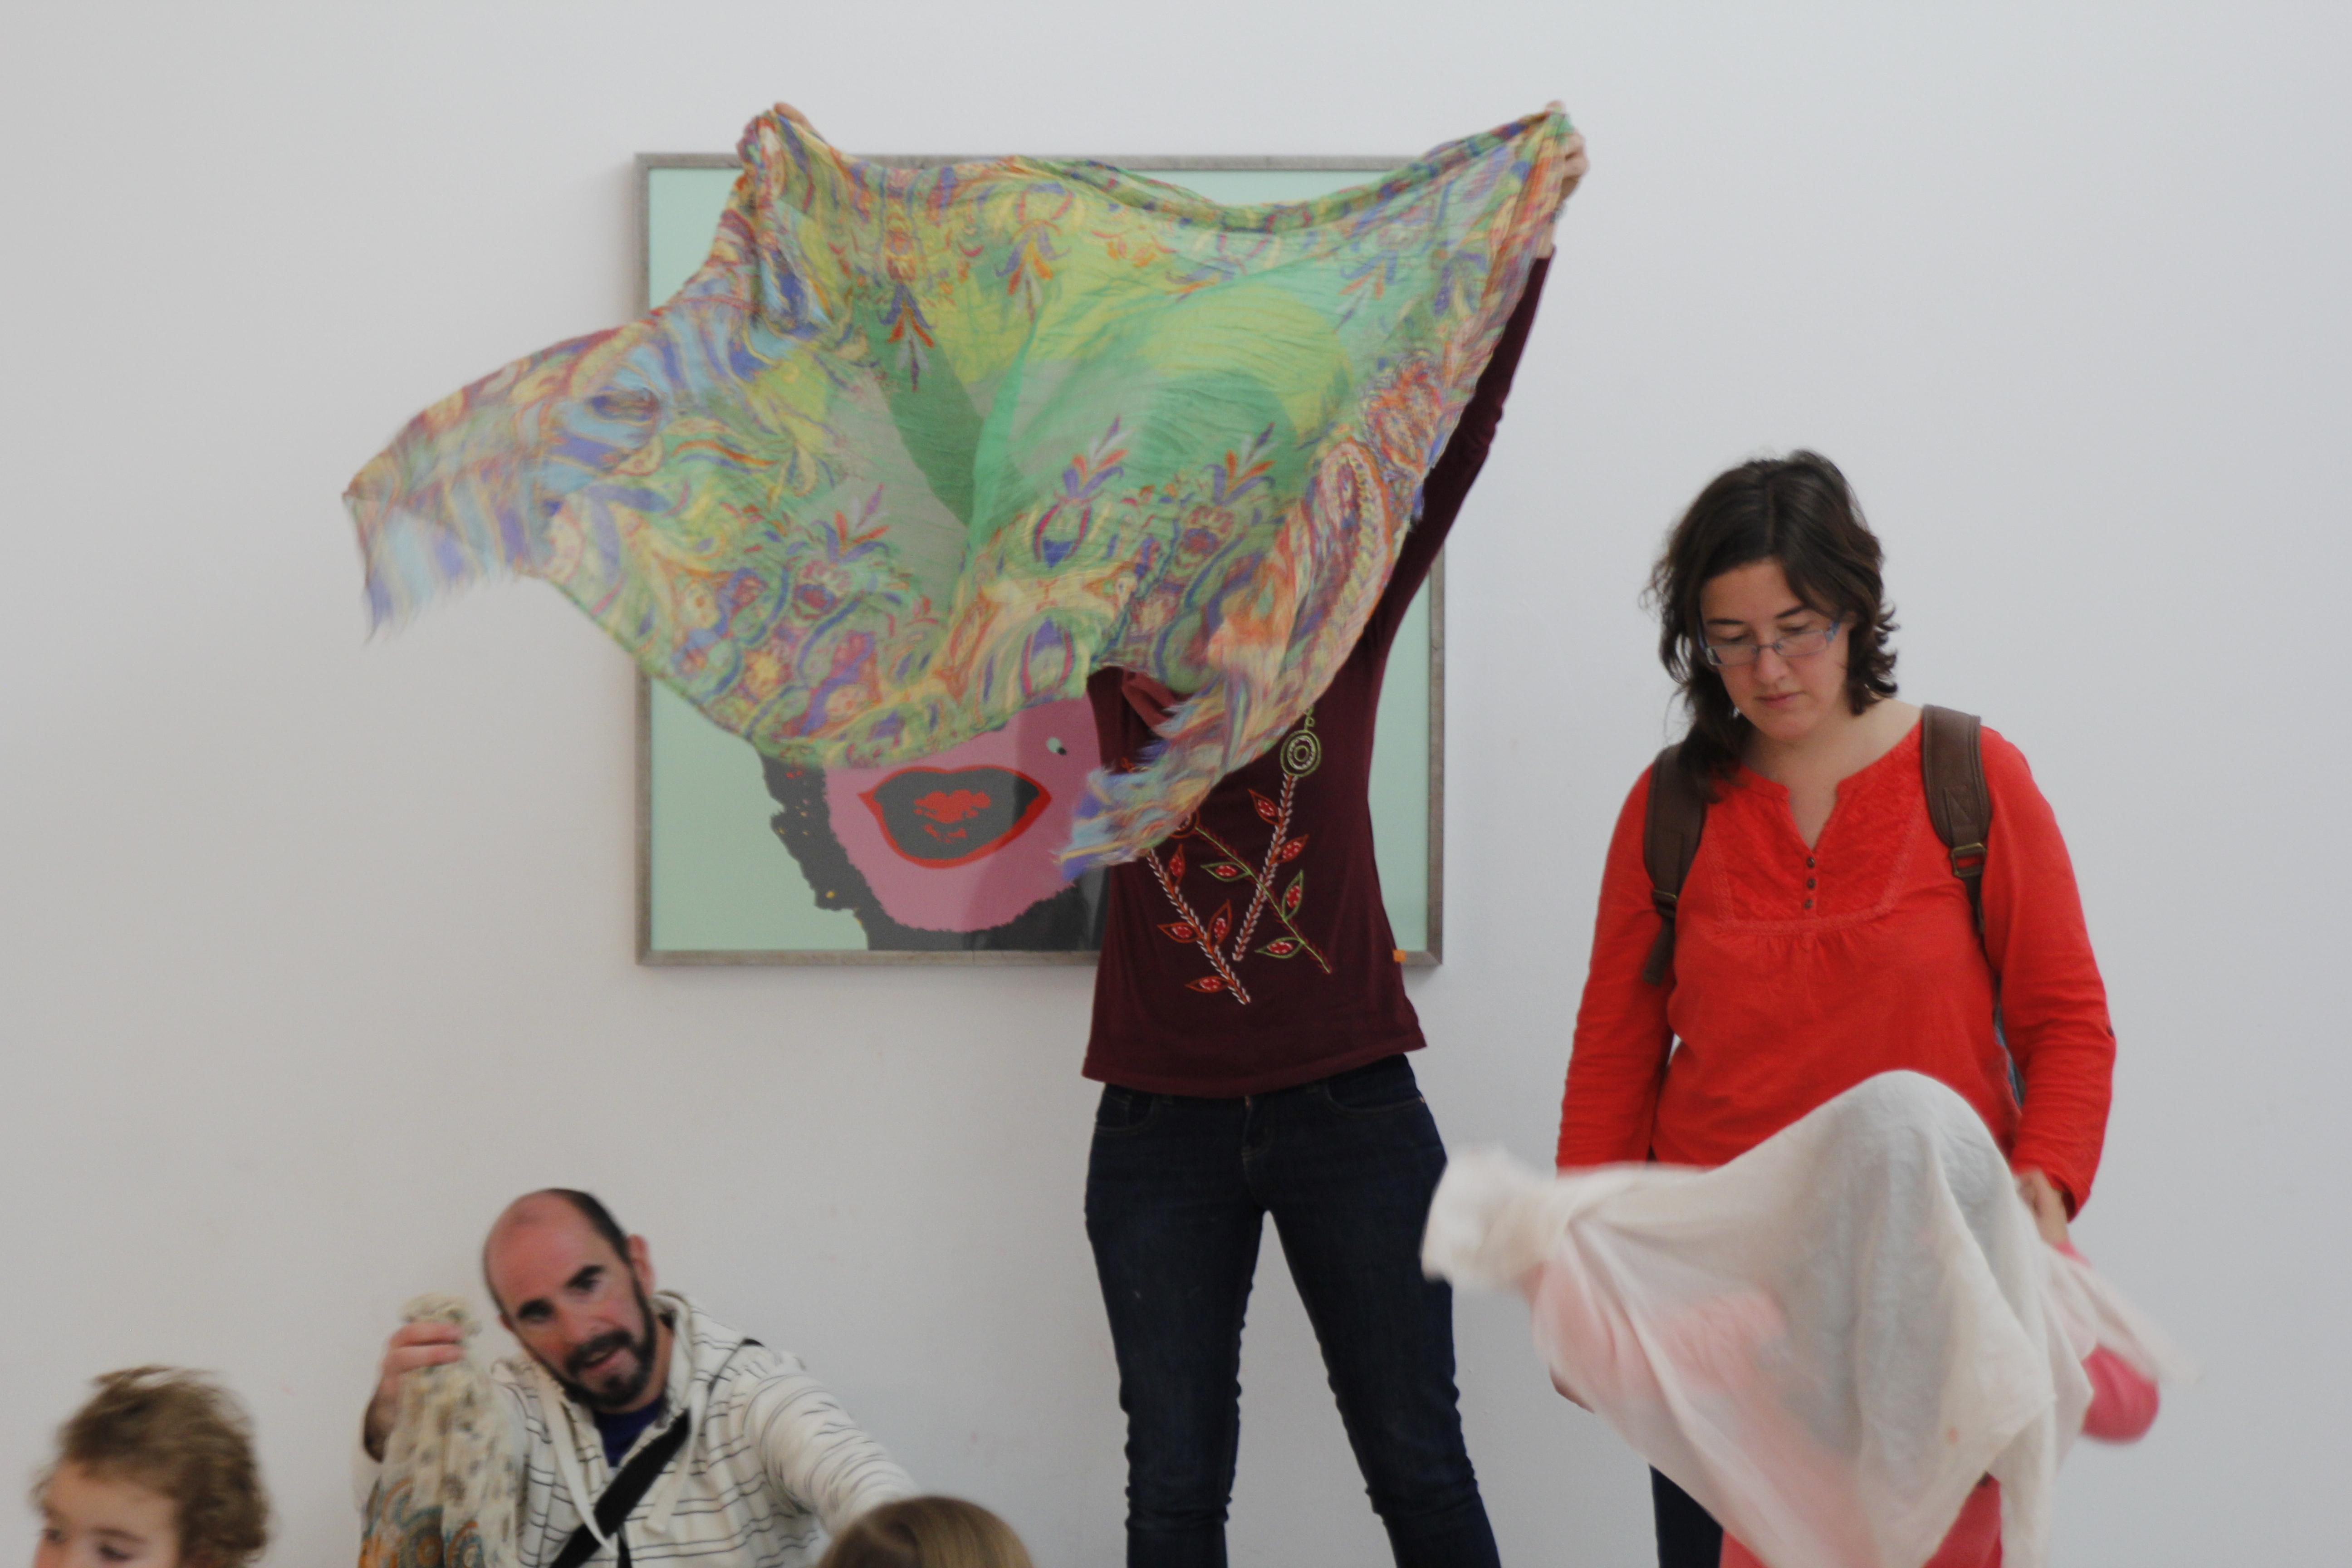 Cepeda, Migue Ángel. 2016. Warhol 7.